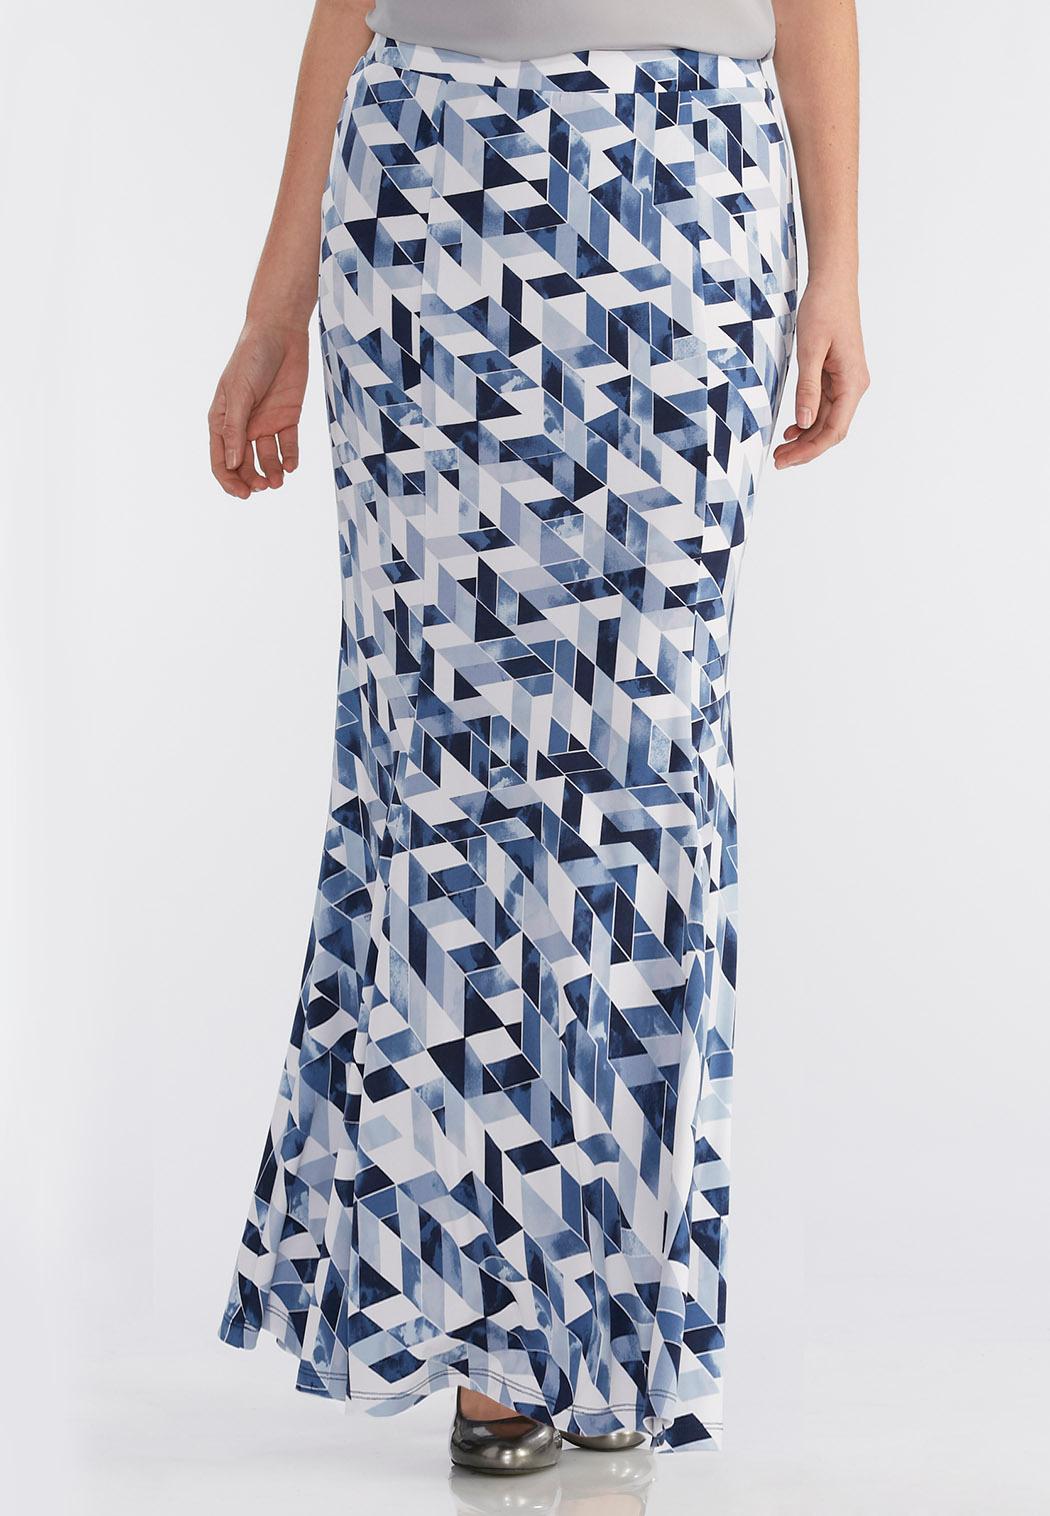 5bf823111e7 Cato Fashions Plus Size Skirts